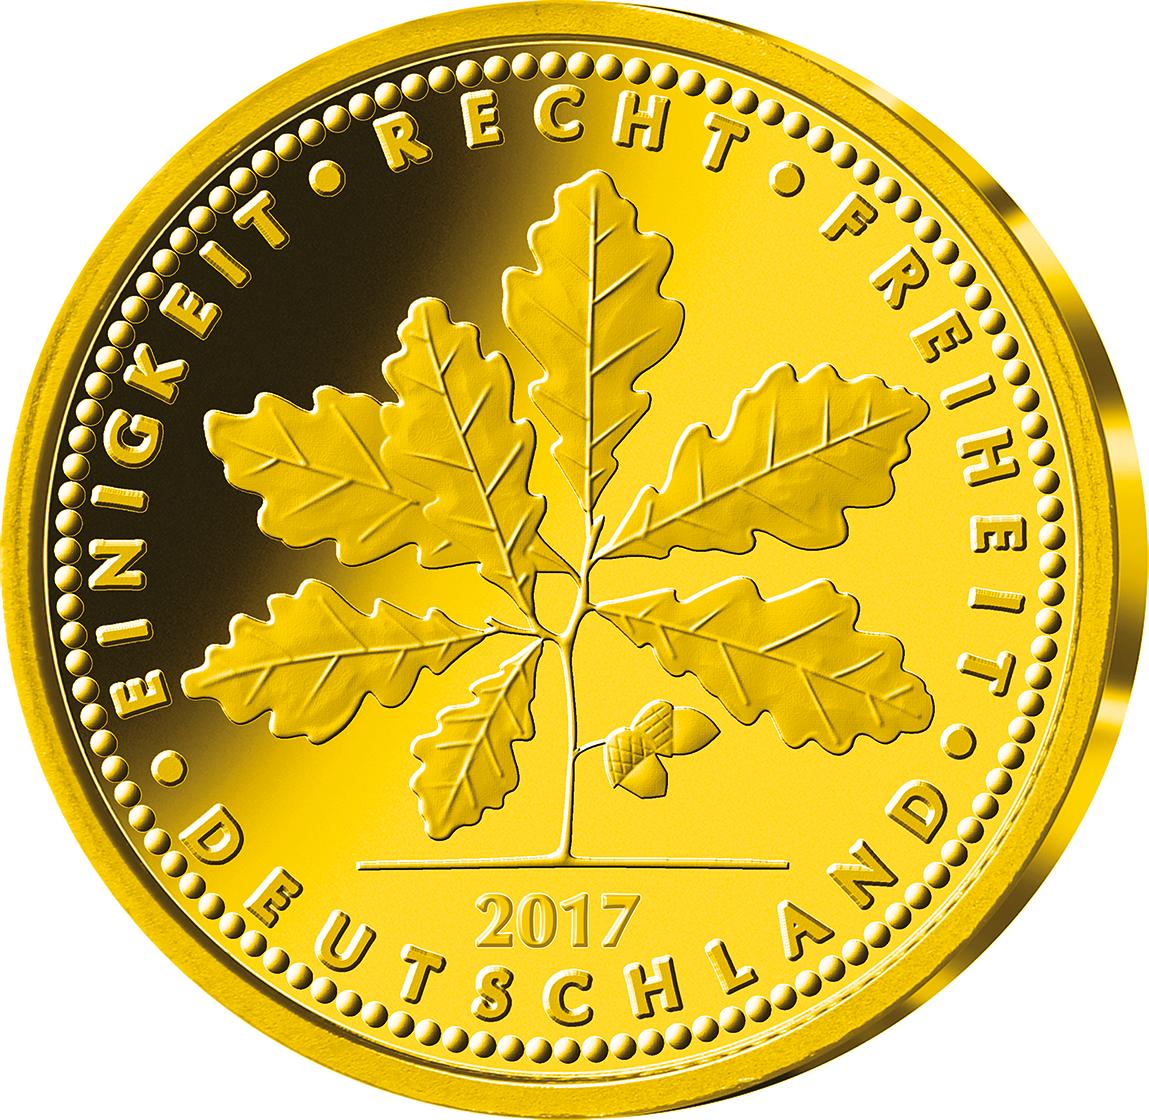 Kostbares Edelmetall Super Preiswert Pragung Gold Echtes Gold